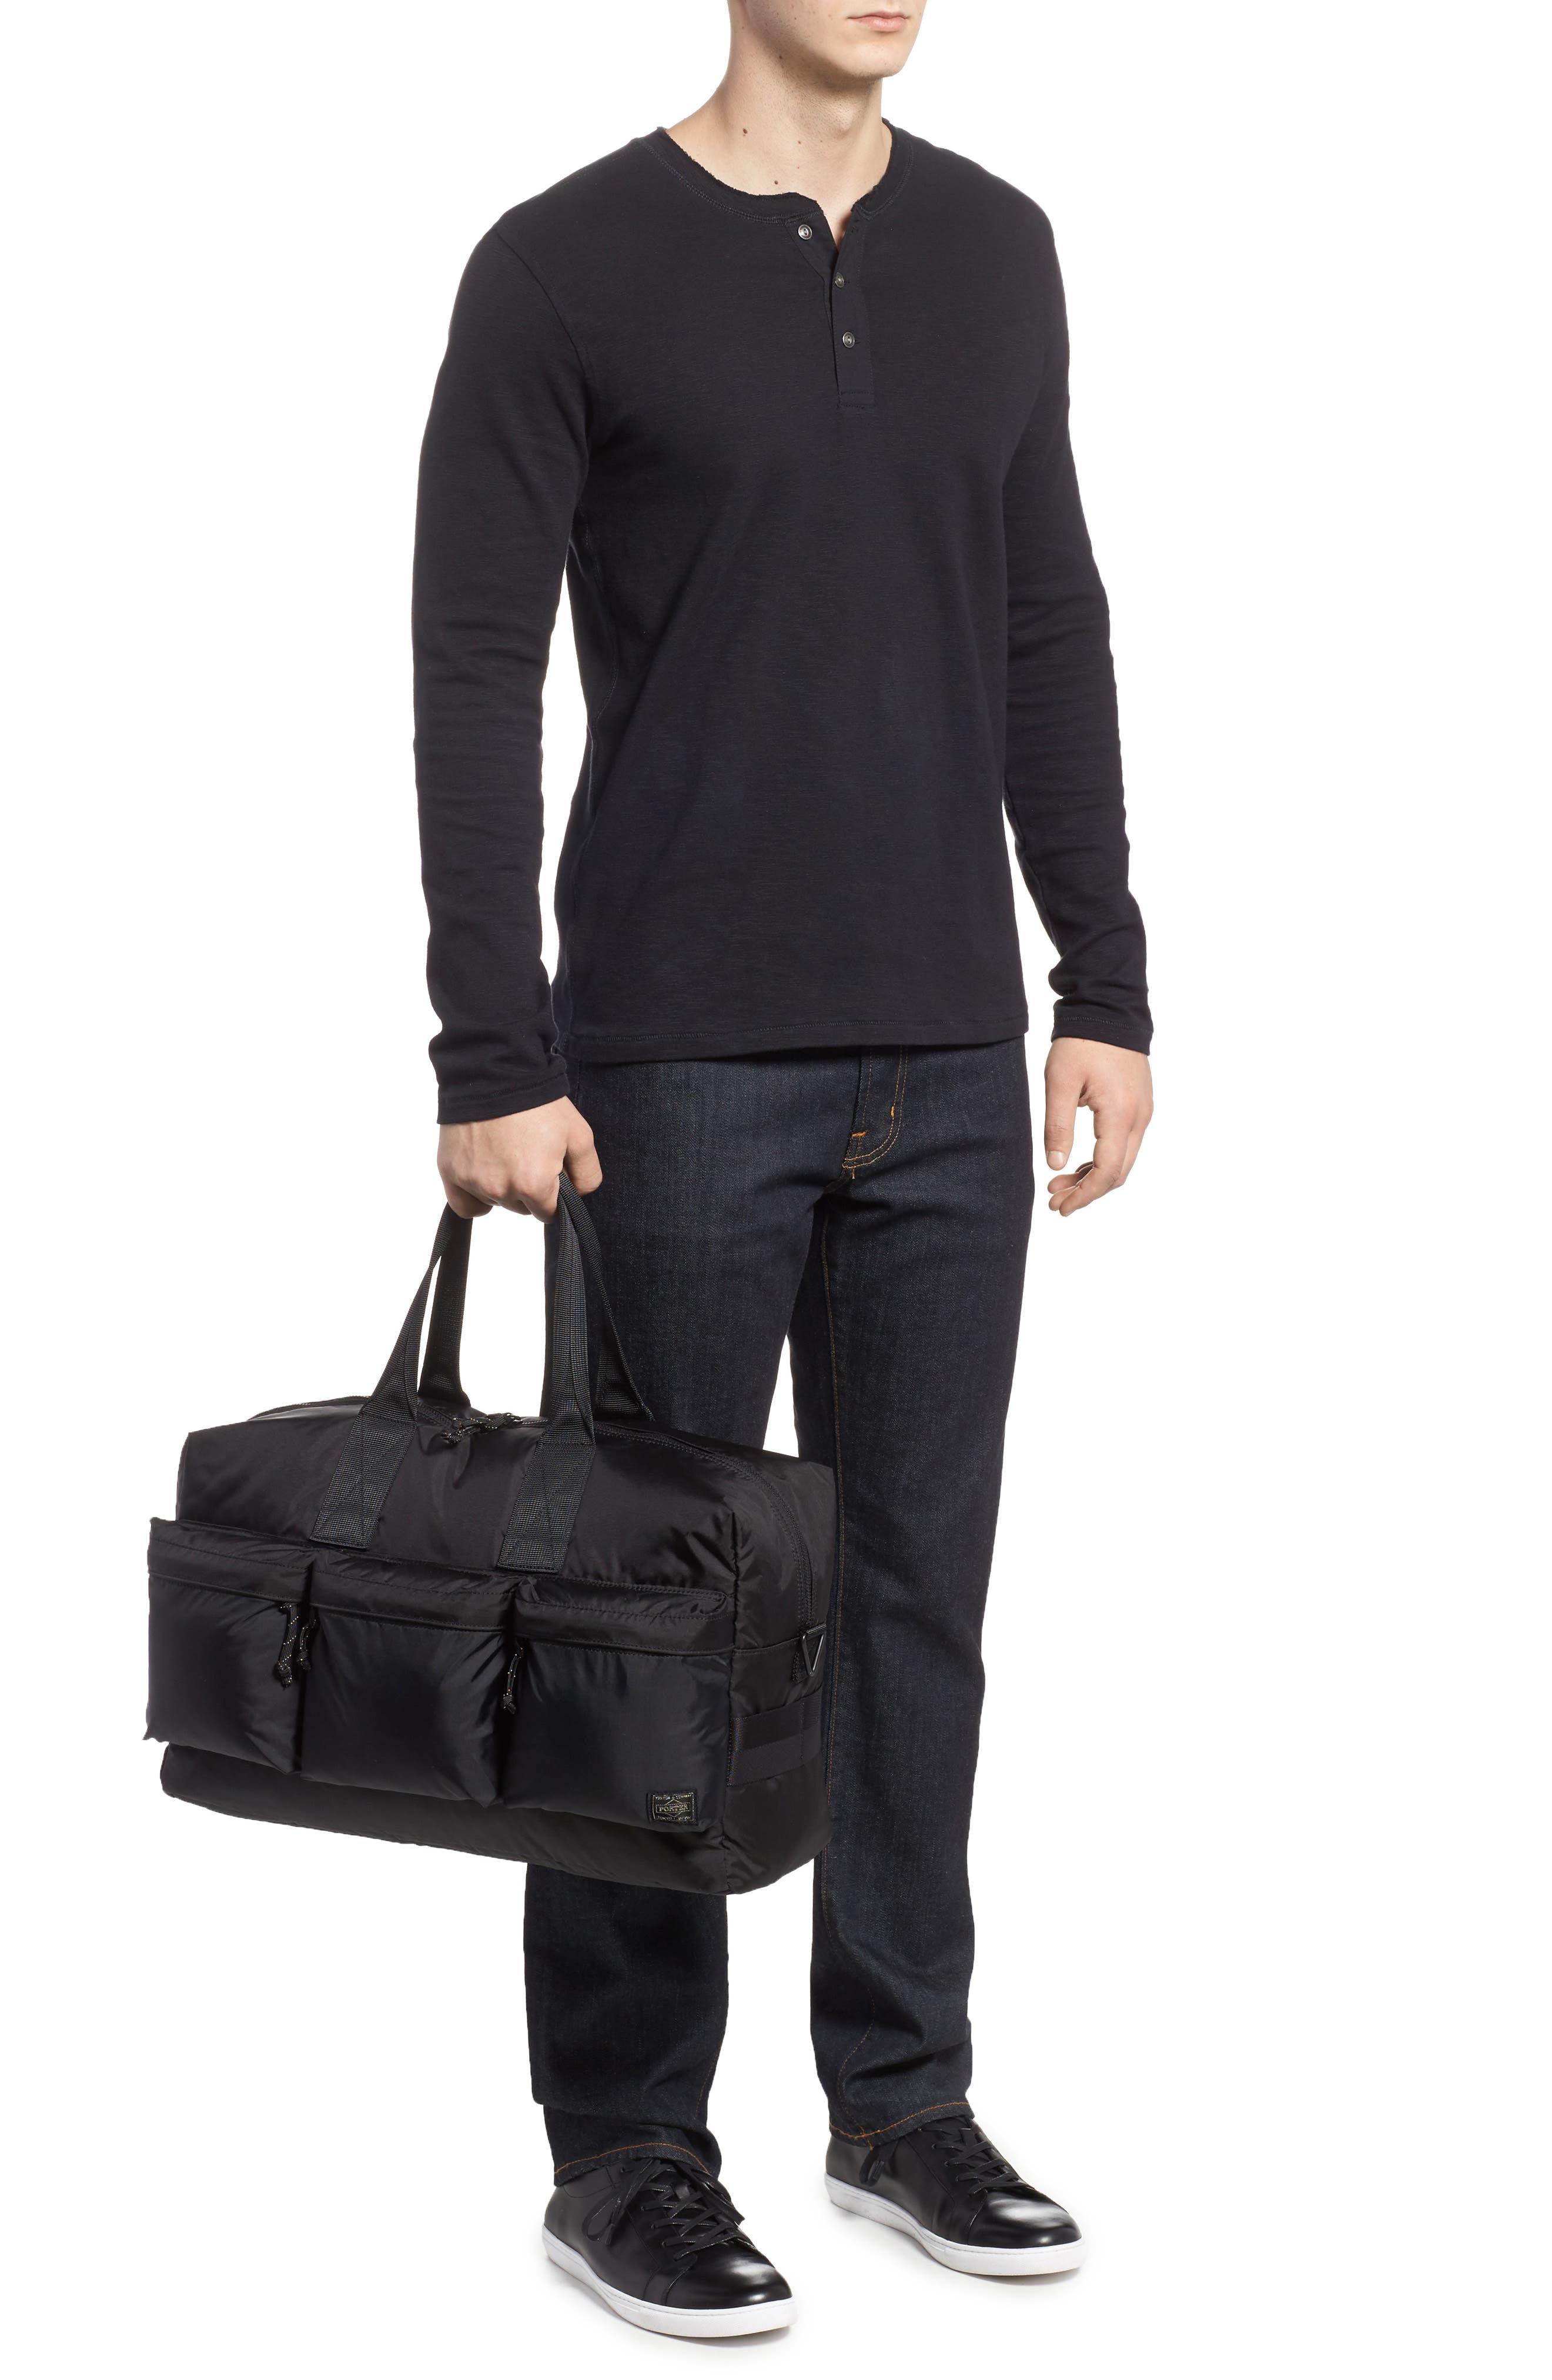 Porter-Yoshida & Co. Force Duffel Bag,                             Alternate thumbnail 2, color,                             Black